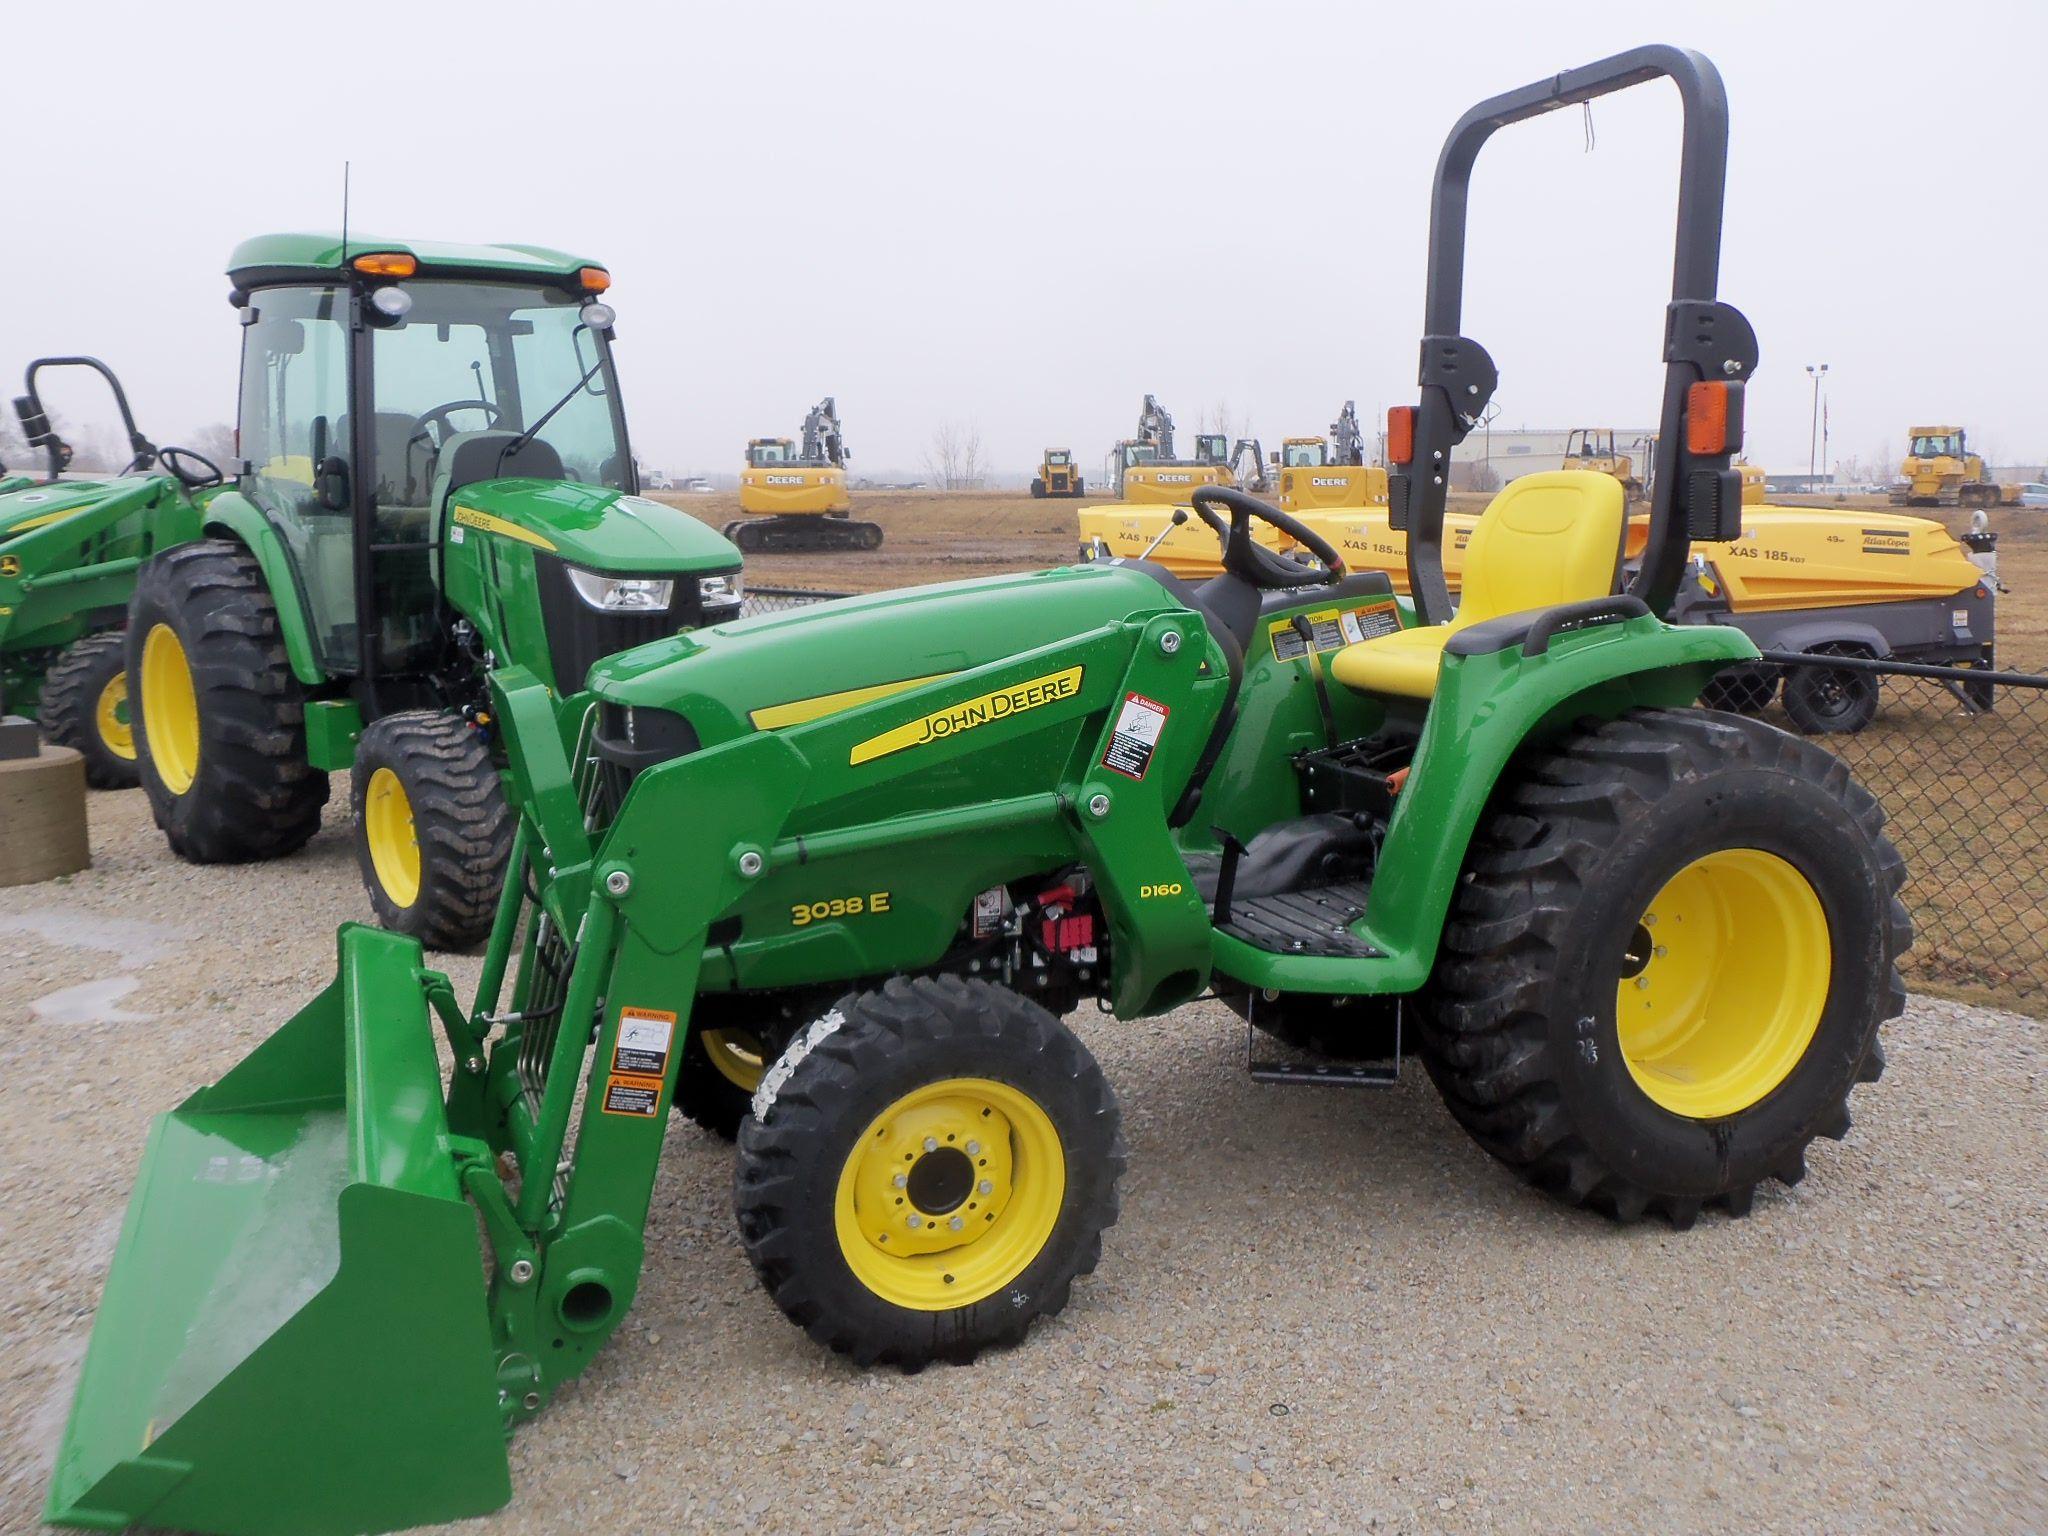 John Deere Lawn Tractors D120 : John deere lawn tractor d hibiscus hotel siesta key